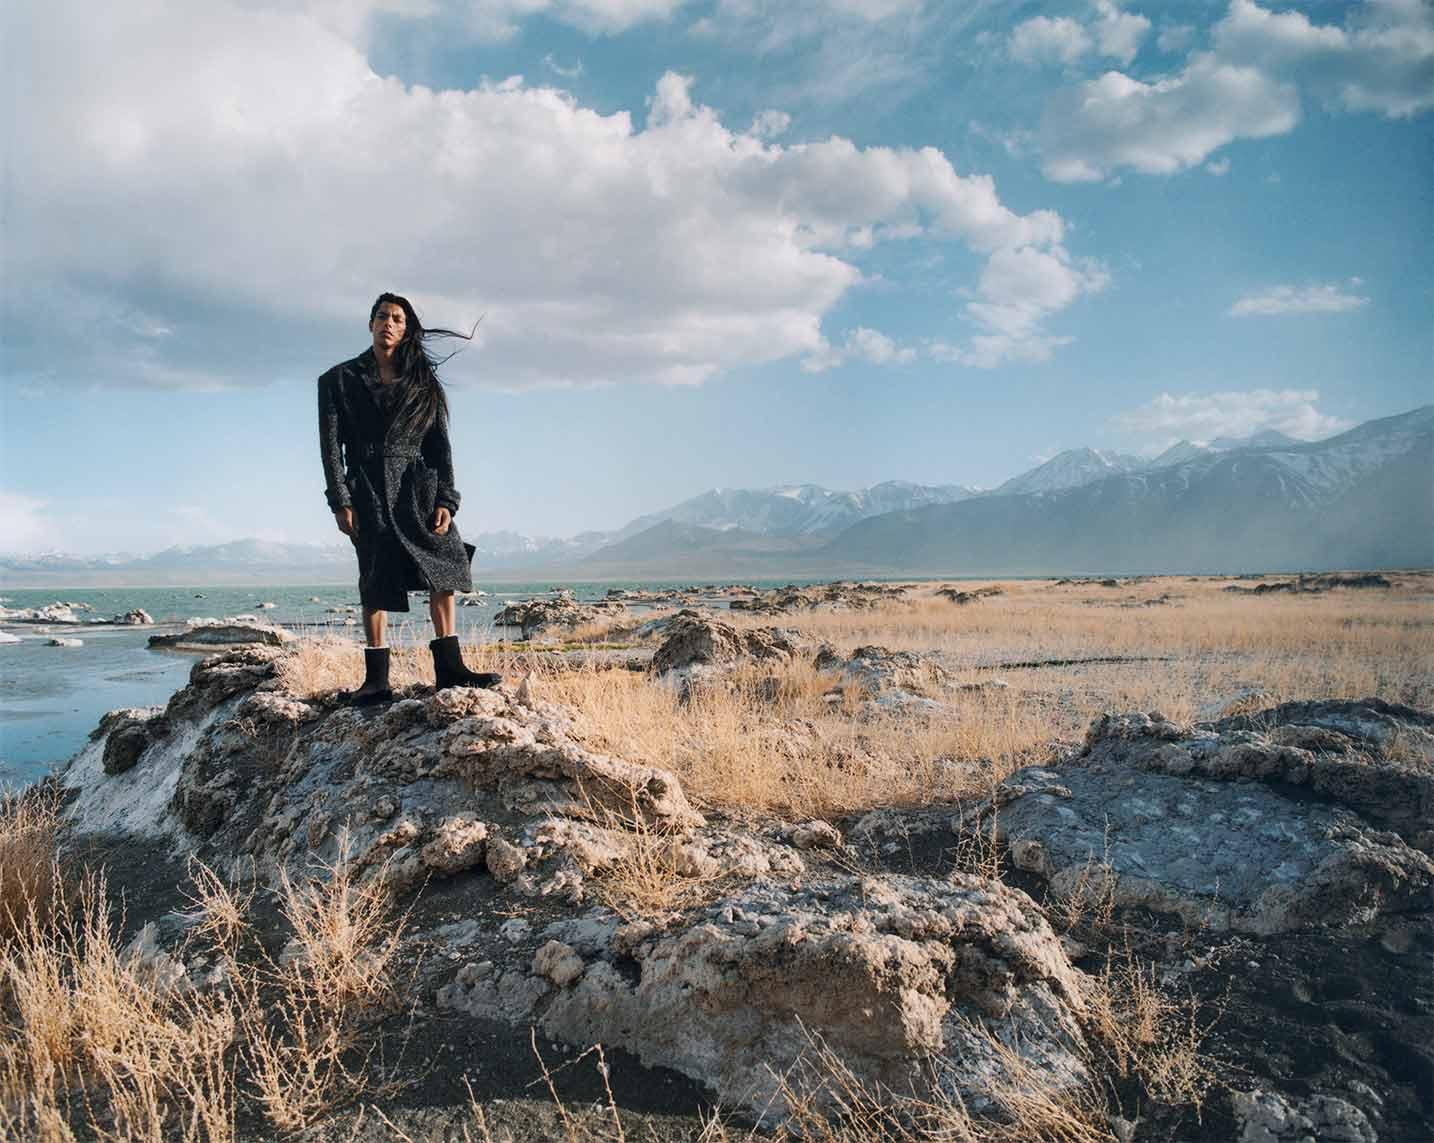 Man standing in field in black, Eckhaus boot.